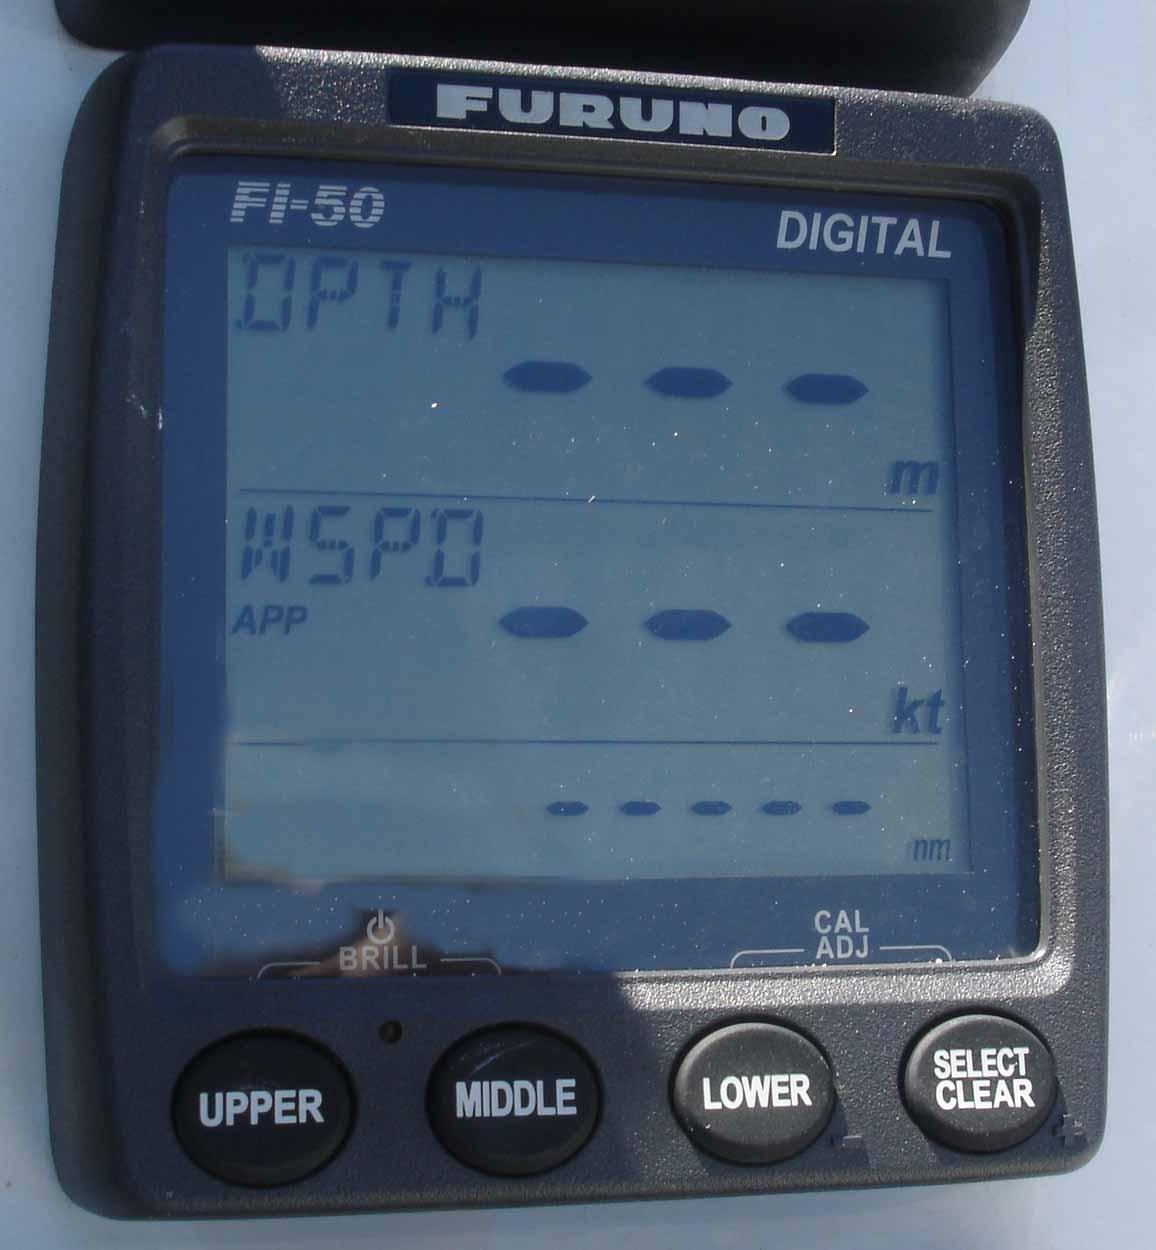 Click image for larger version  Name:Furuno log.JPG Views:219 Size:102.6 KB ID:11595